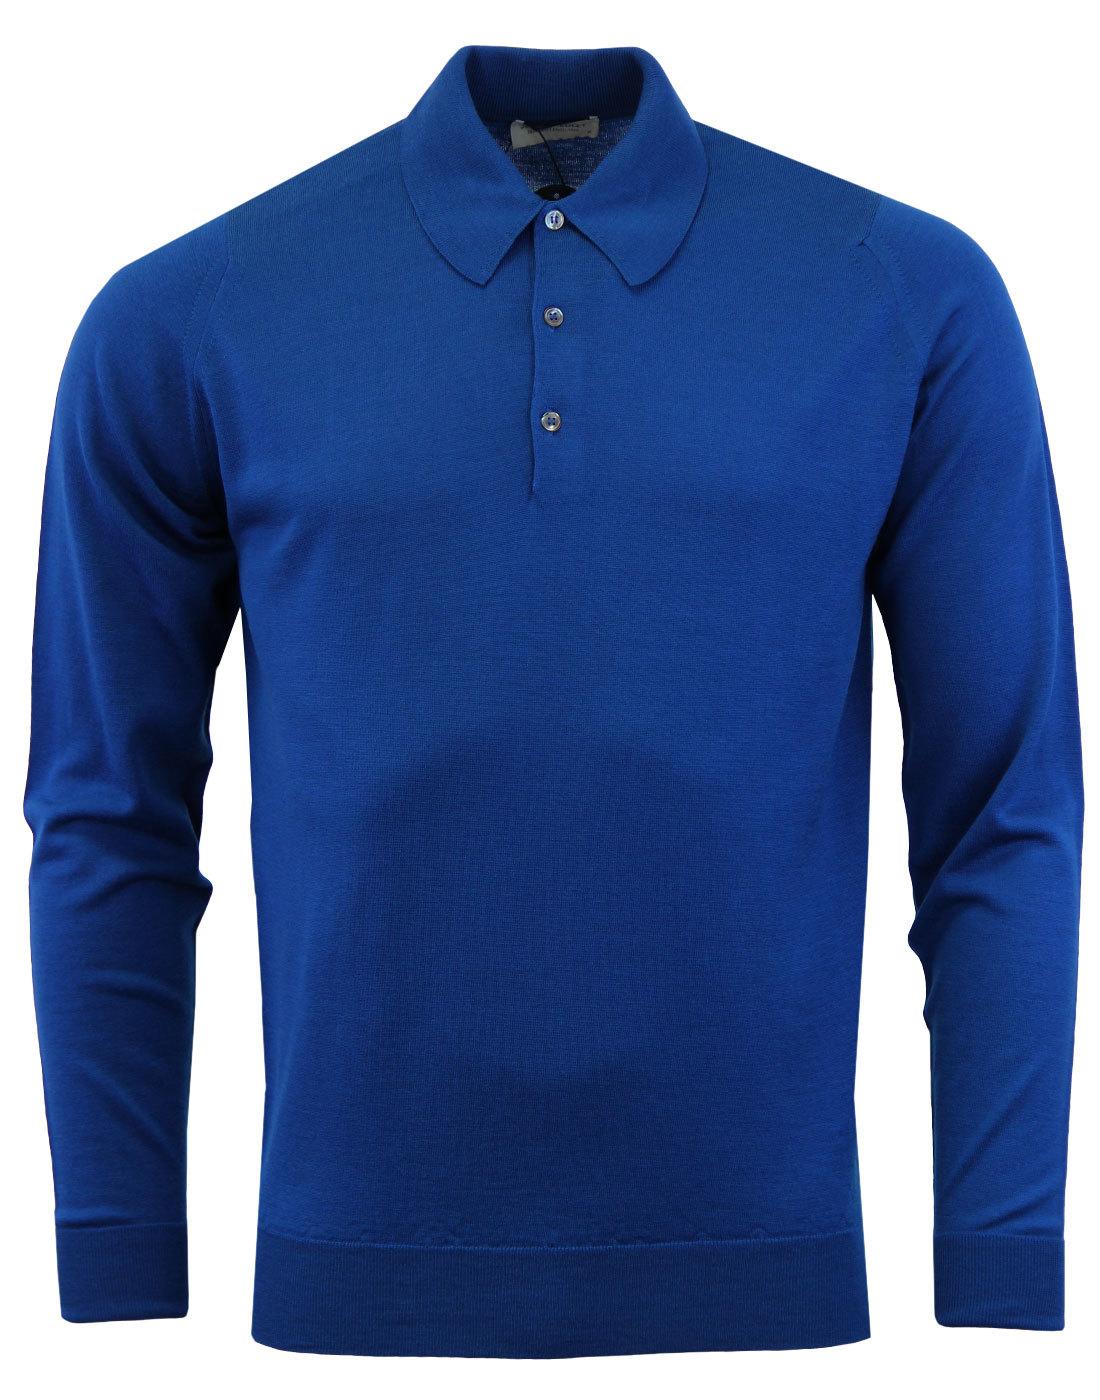 Dorset JOHN SMEDLEY Retro 60s Mod Knitted Polo BB